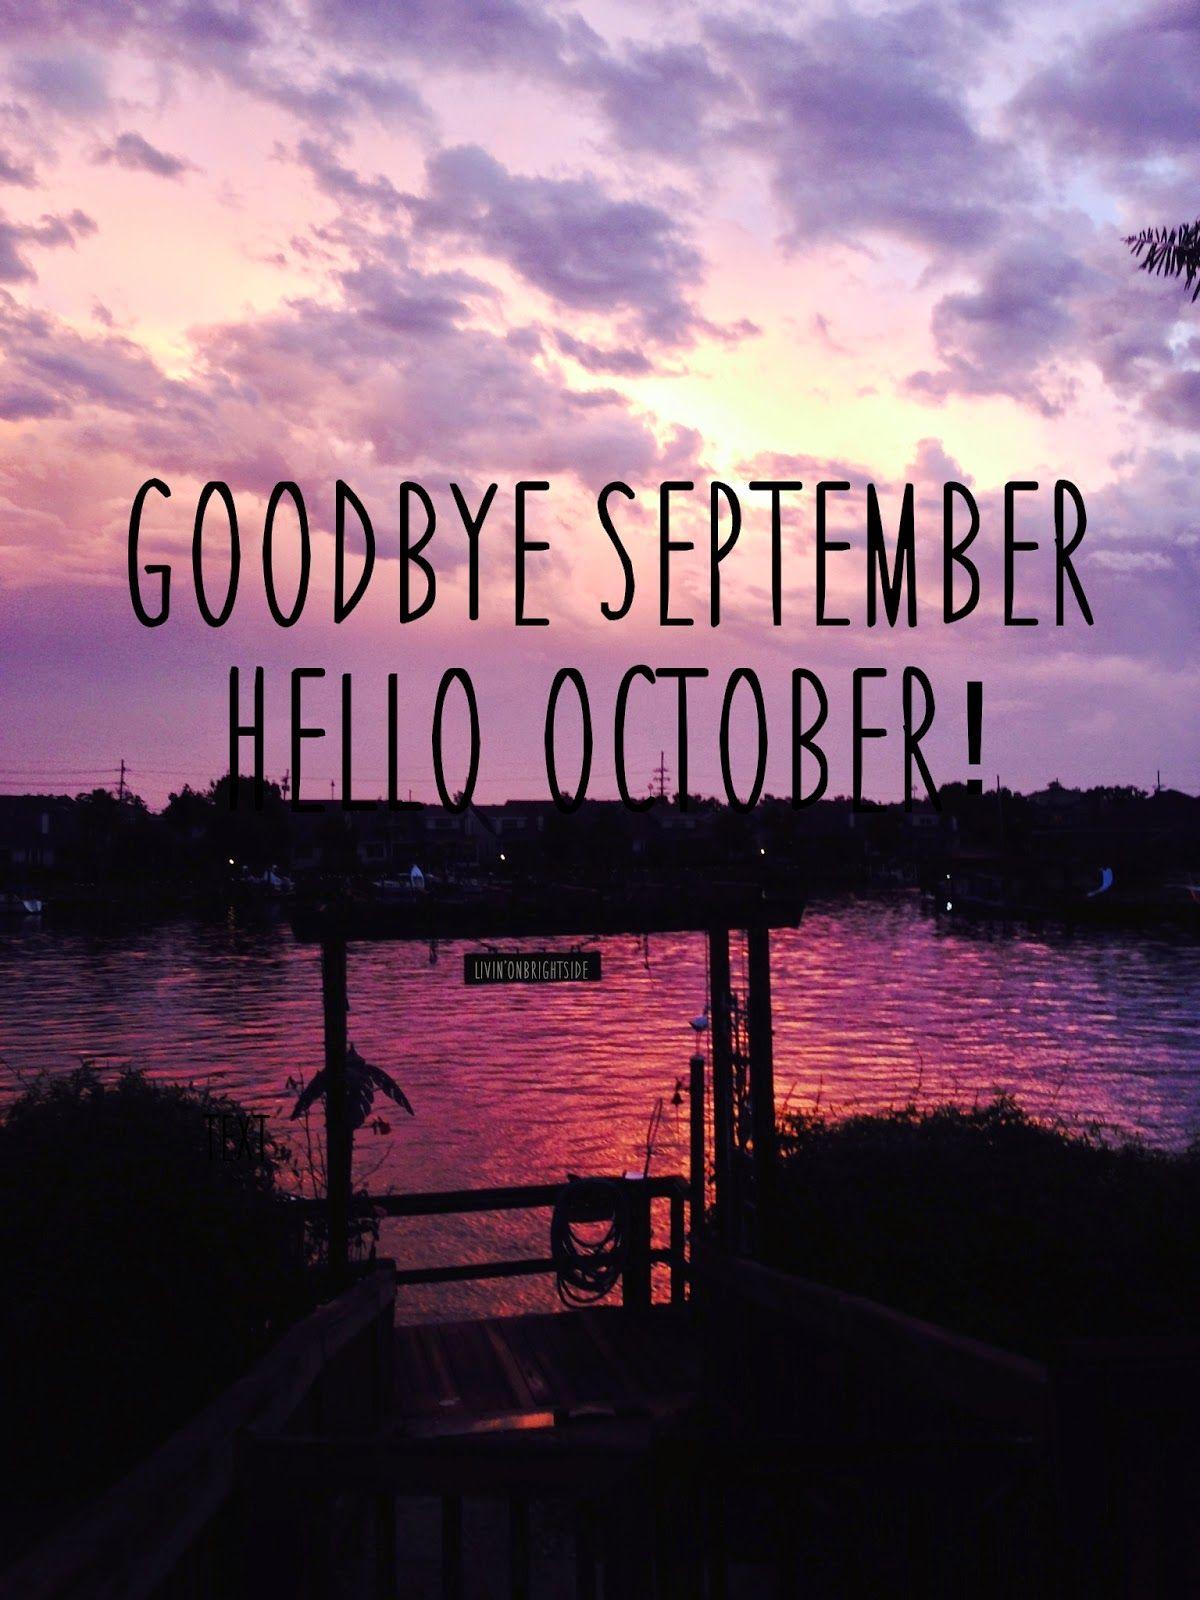 Hello October Xo